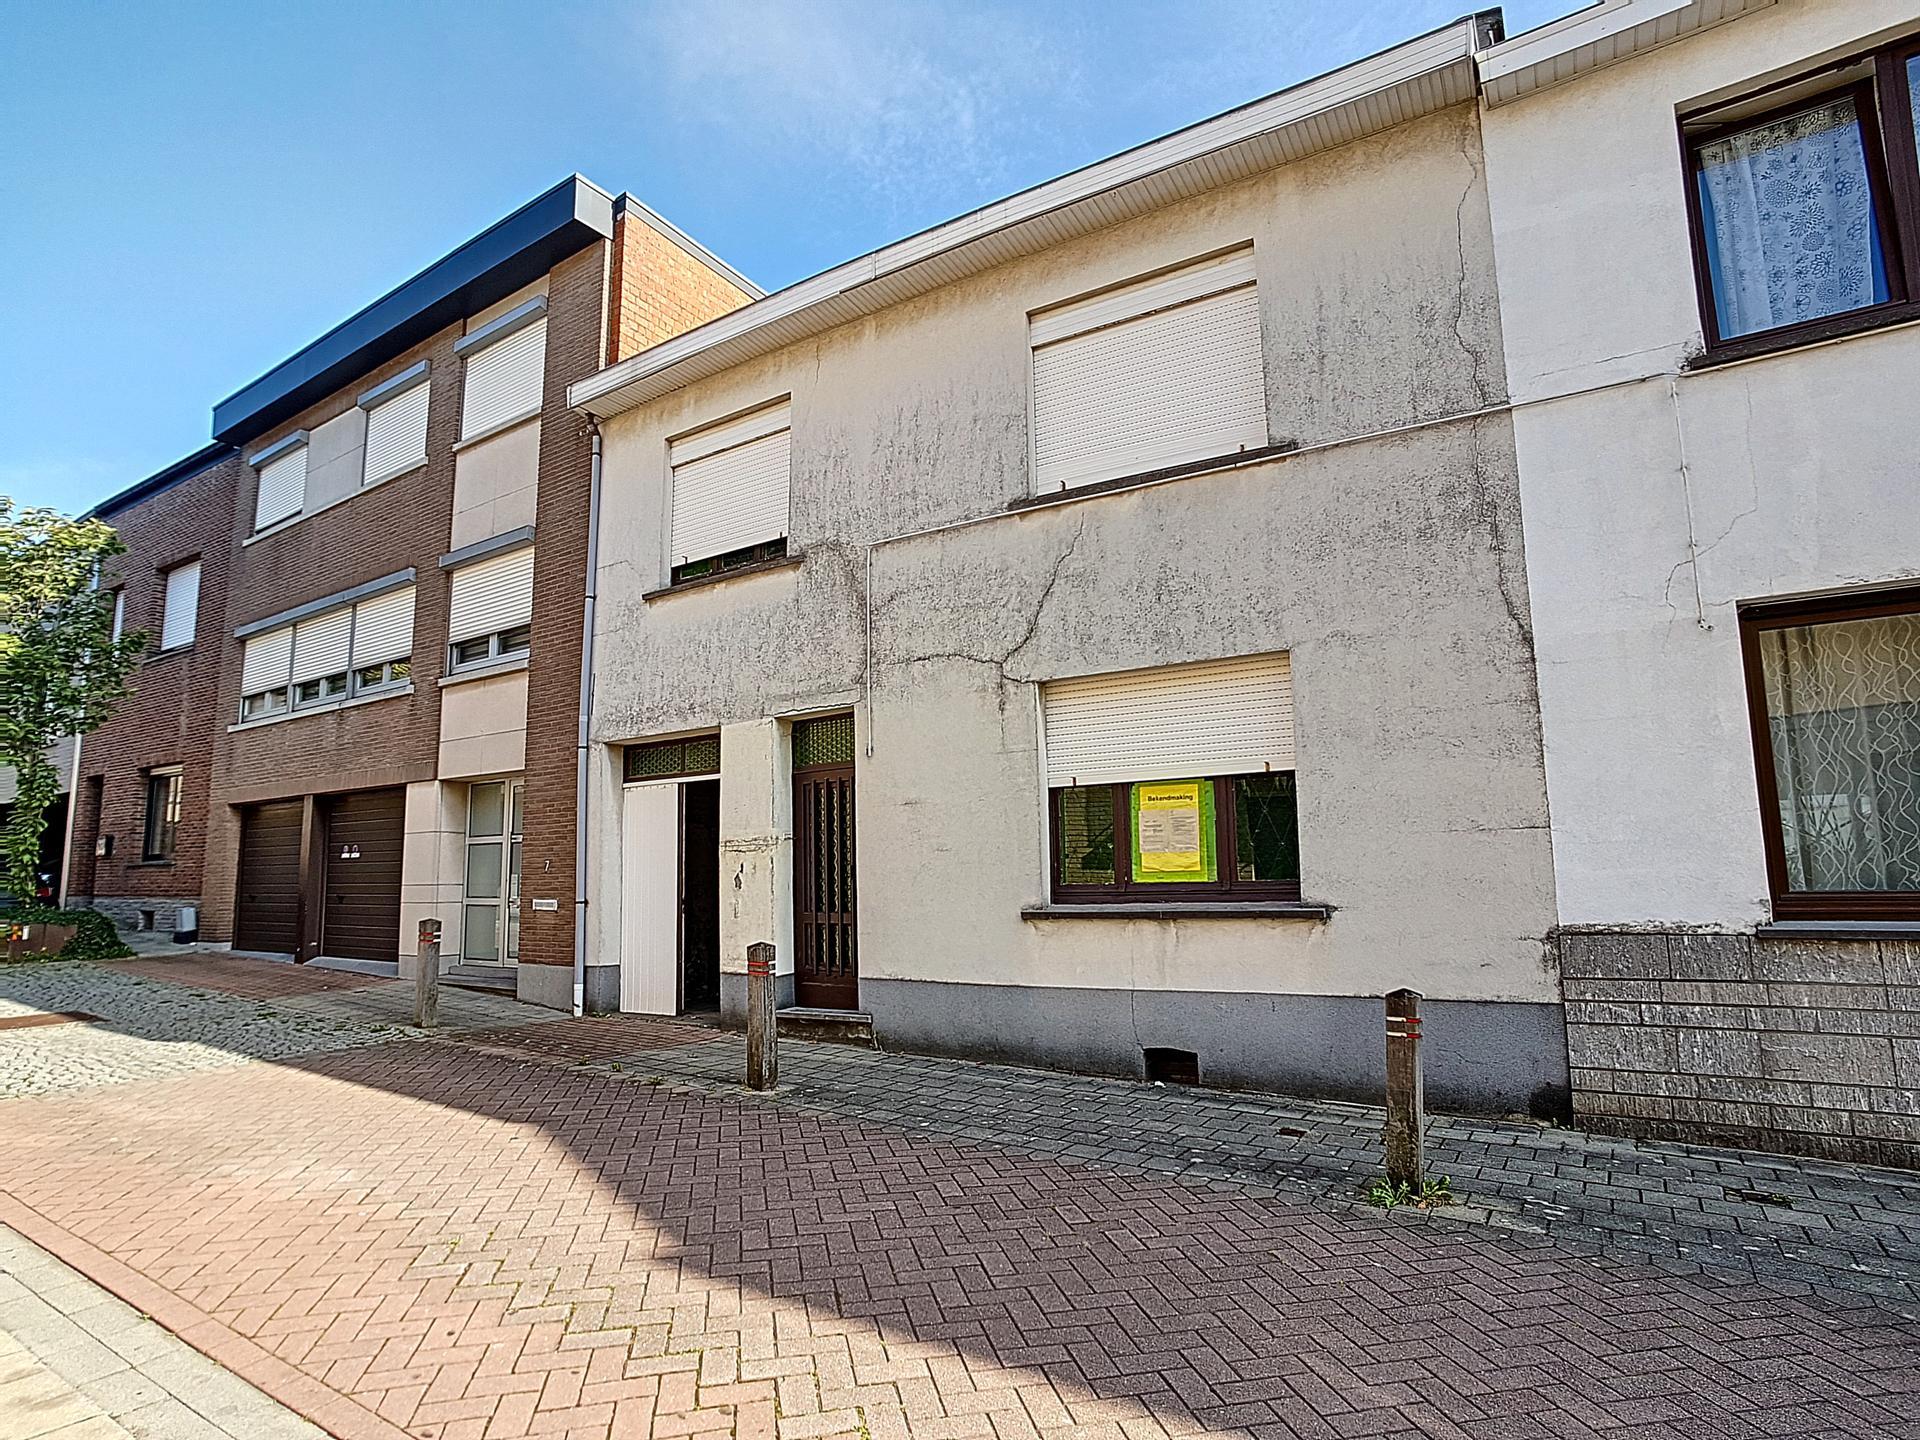 Maison - Zaventem Sterrebeek - #4507431-1